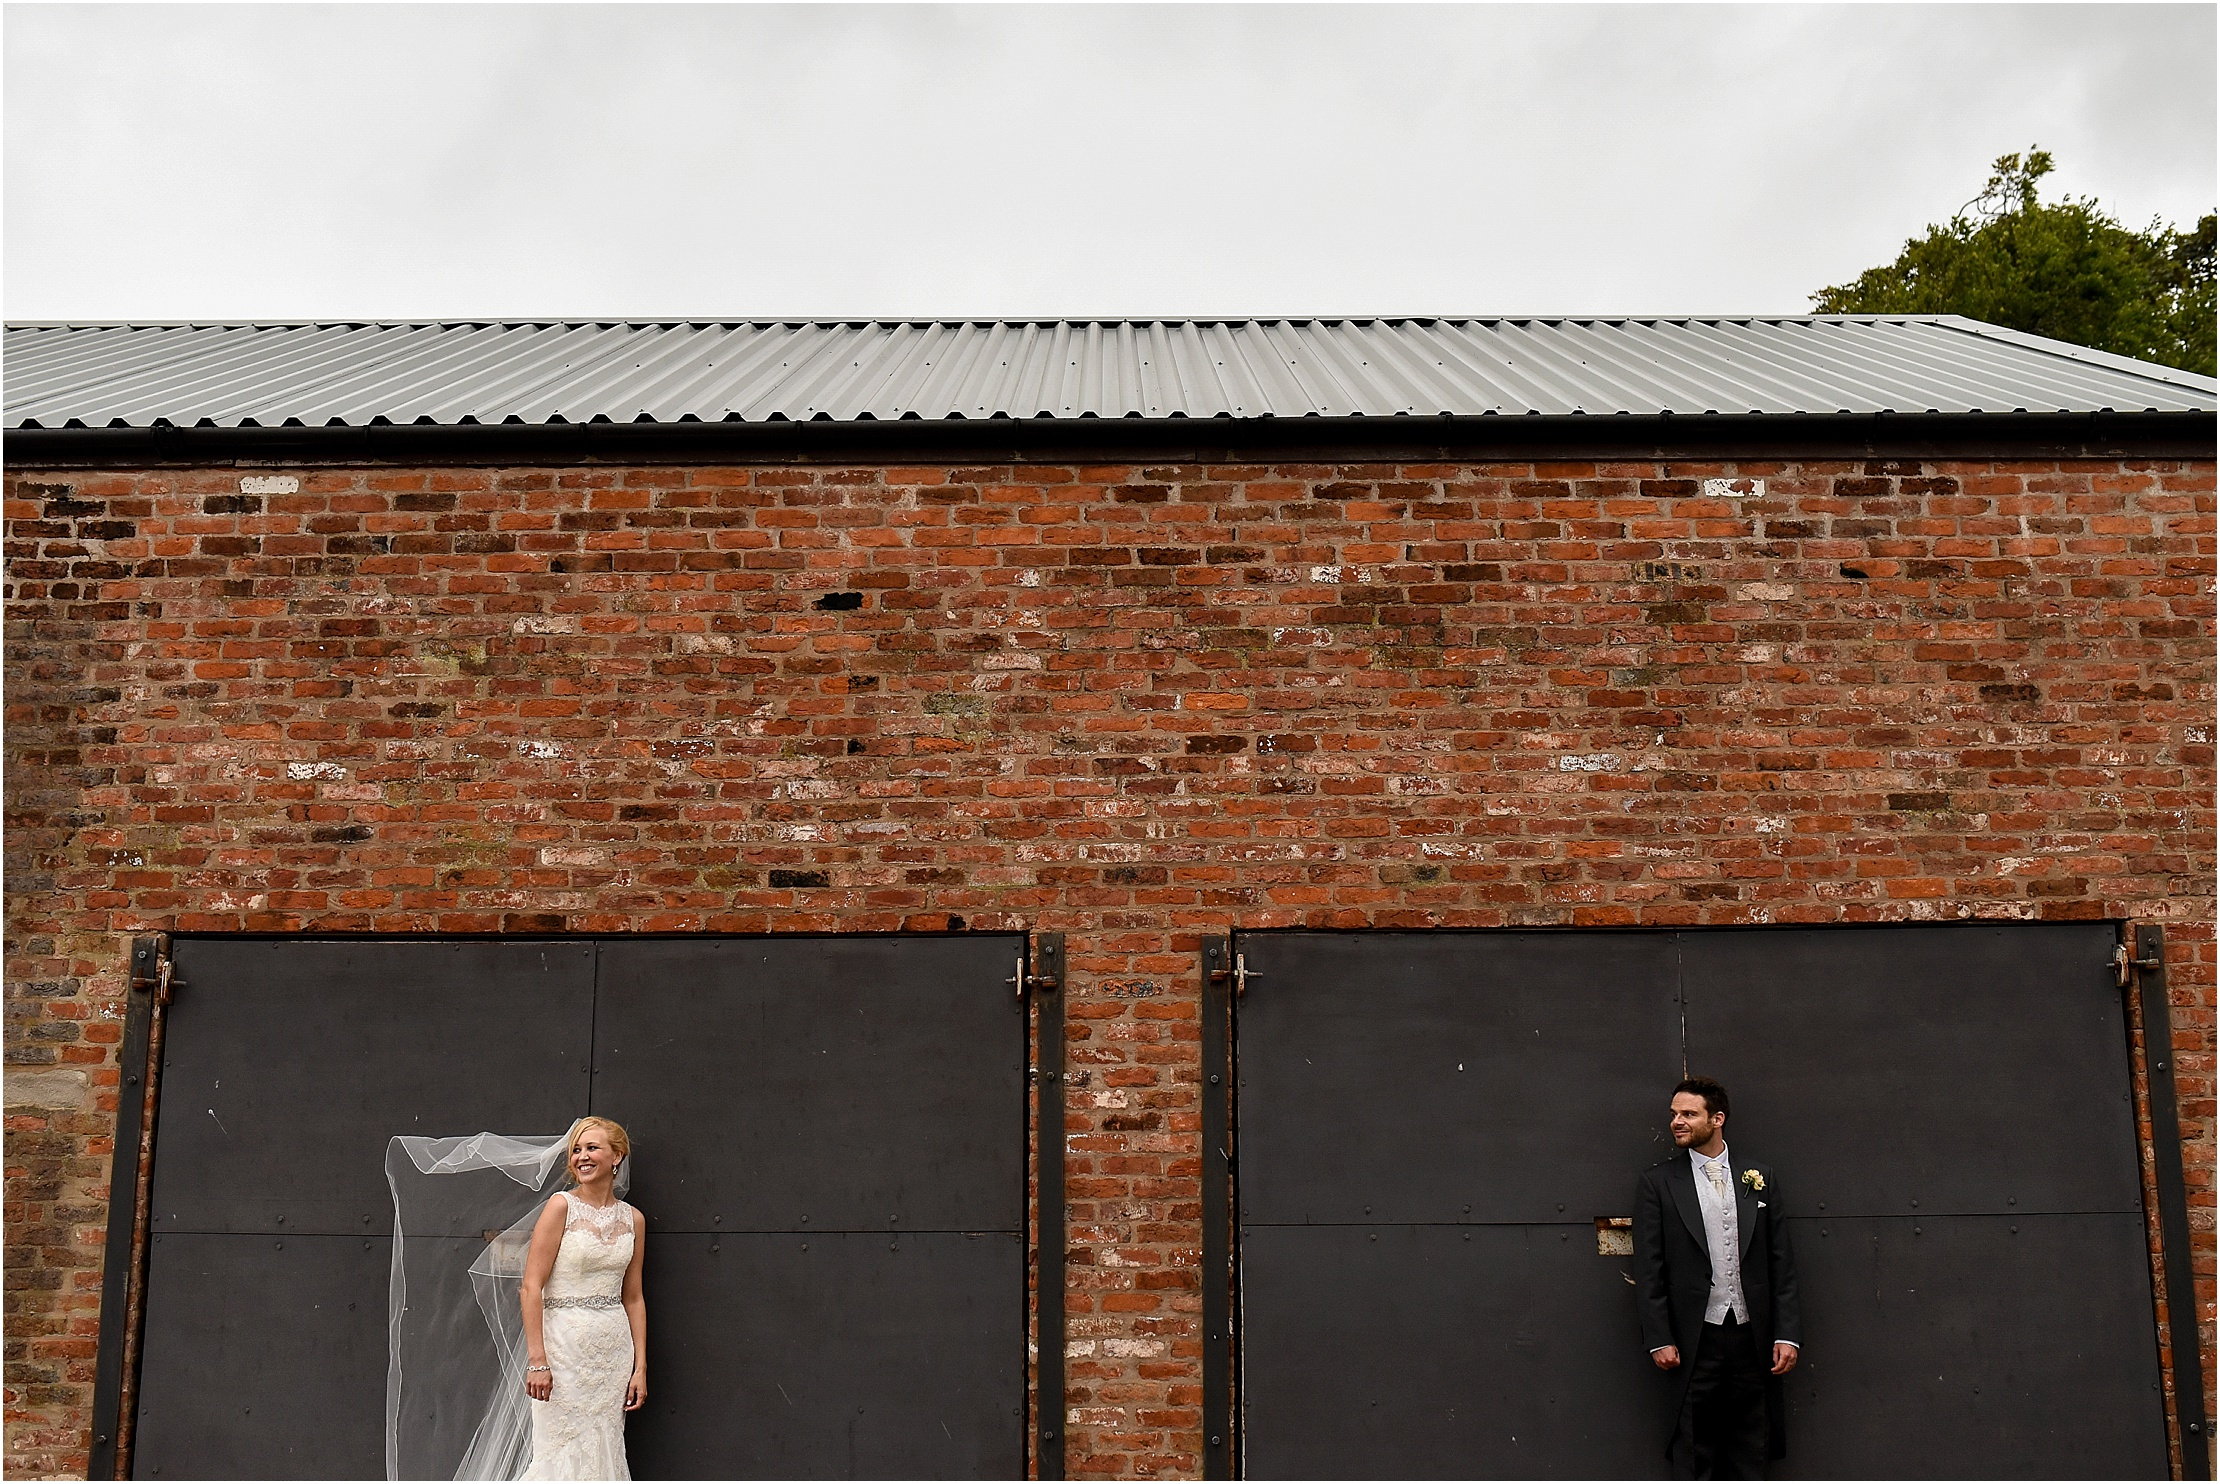 staining-lodge-wedding-111.jpg